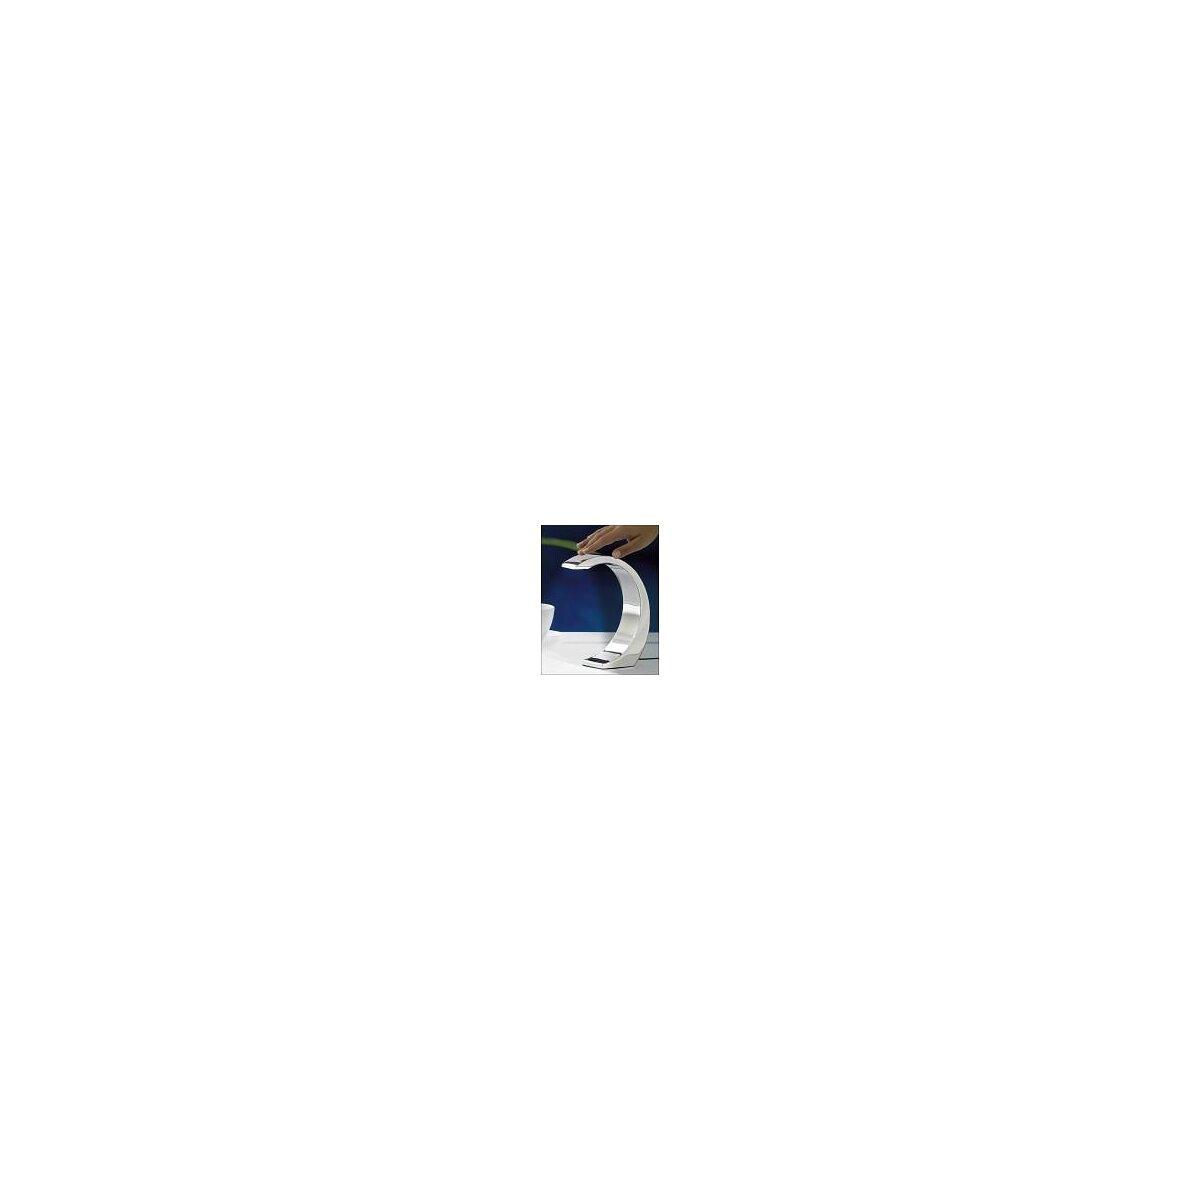 Lunartec 1Watt-LED Design-Tischlampe